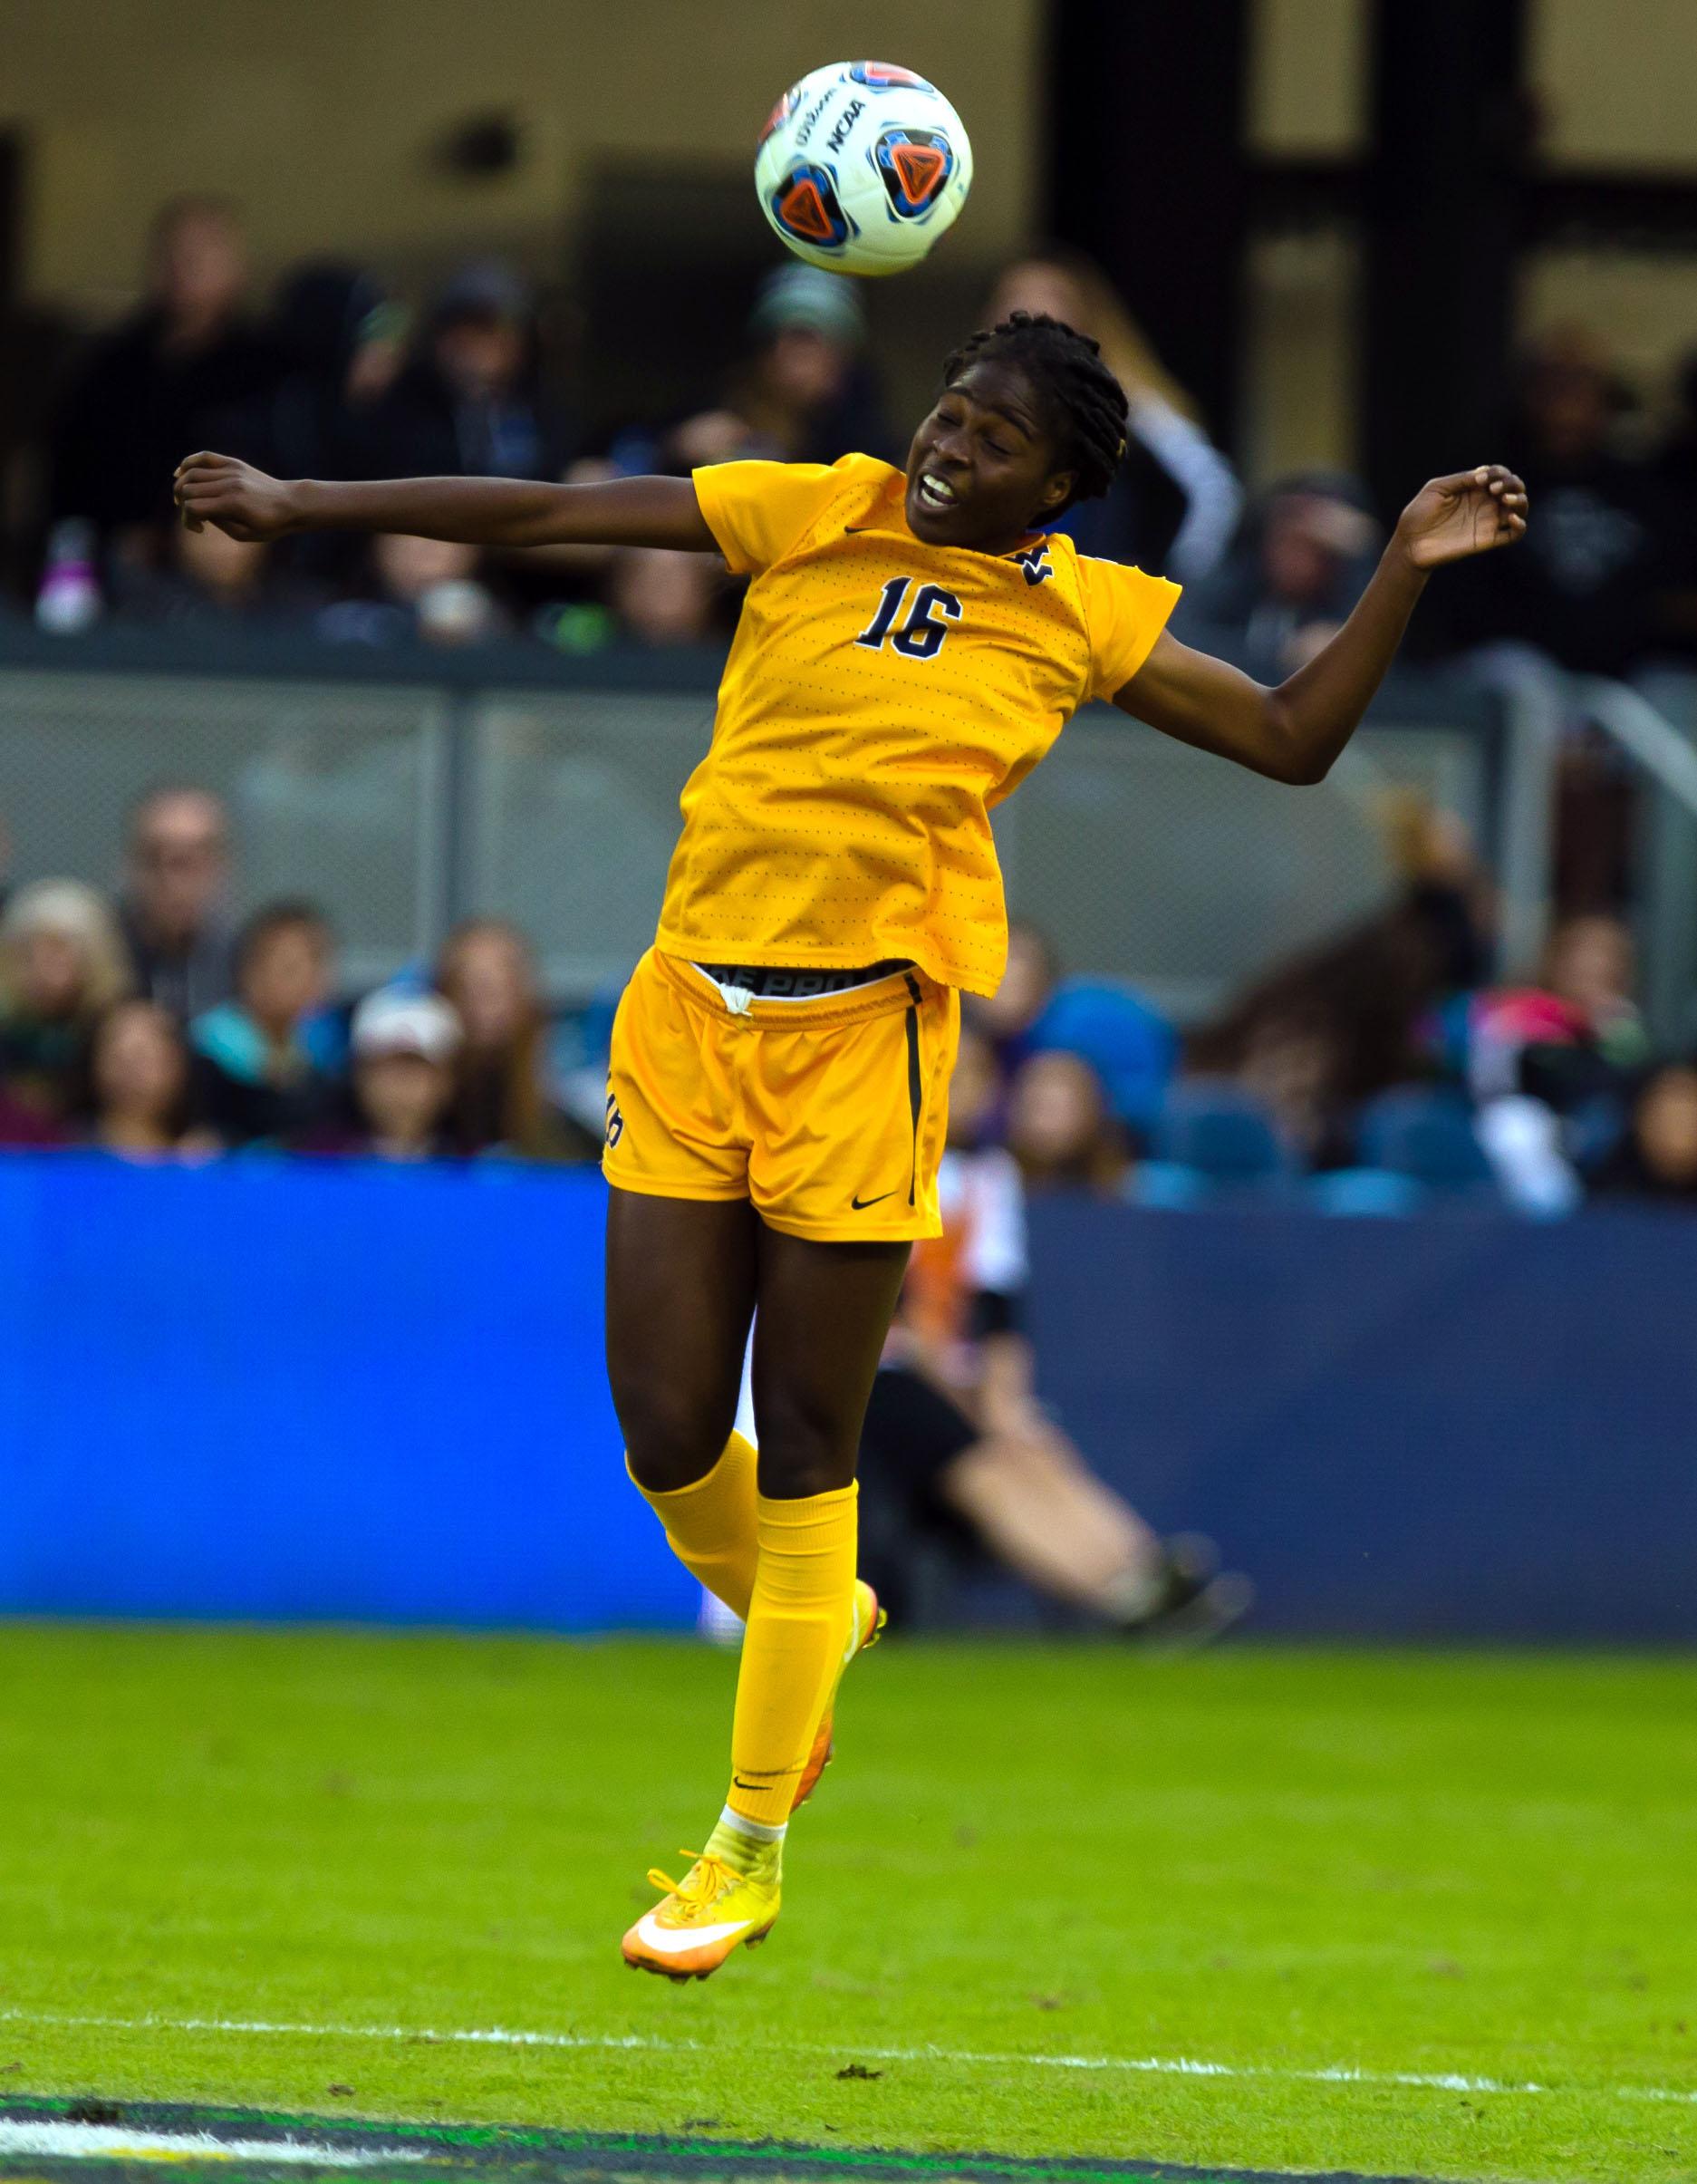 NCAA Soccer: Women's College Cup - West Virginia Mountaineers vs USC Trojans